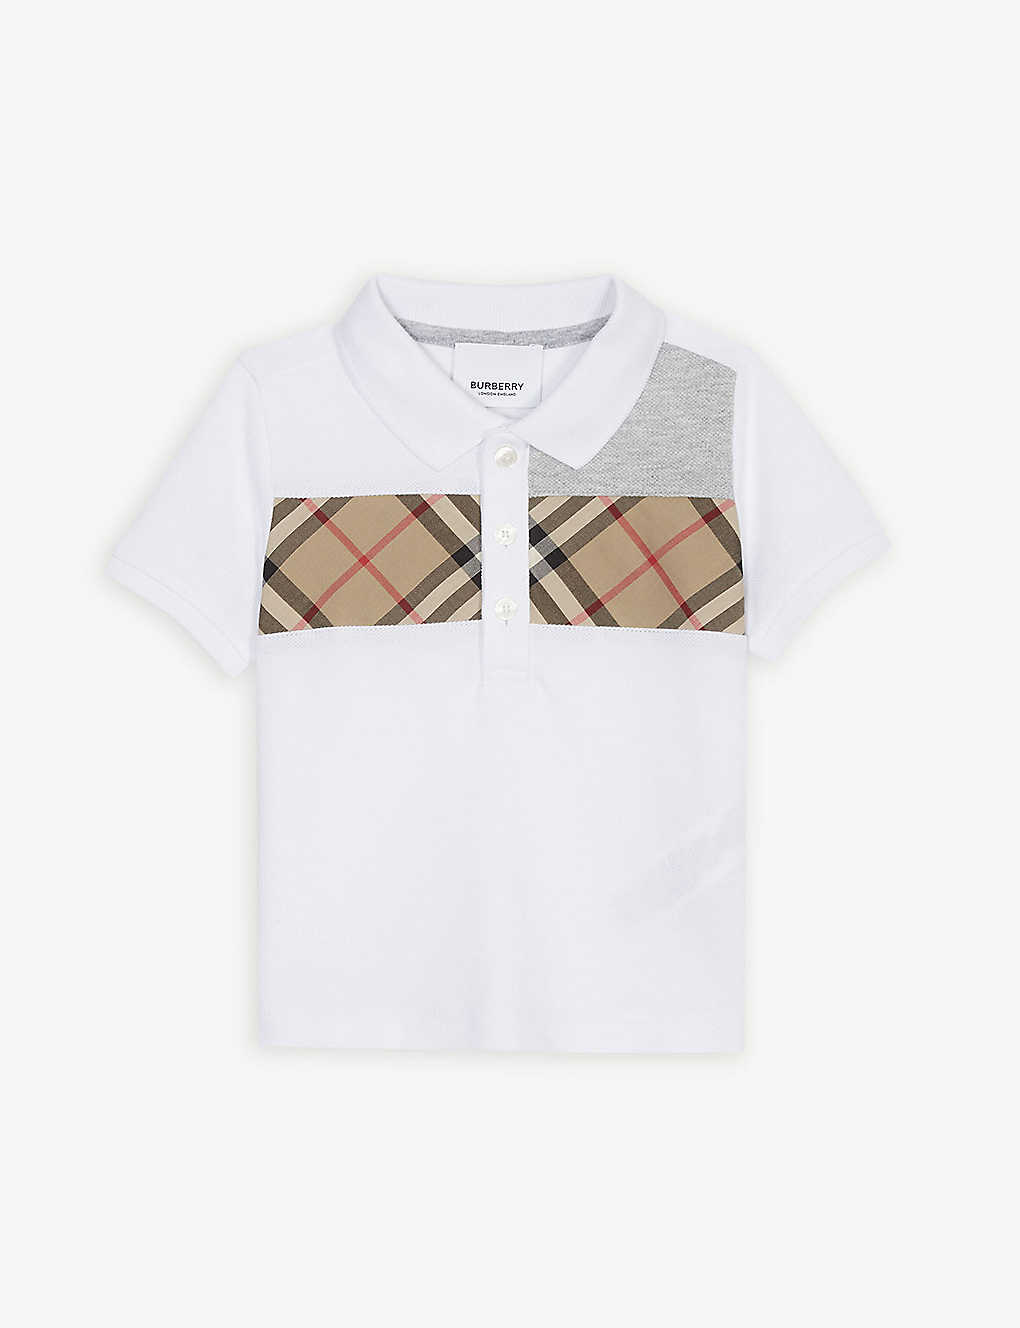 b45ebdd4 BURBERRY - Panelled check cotton polo shirt 6-24 months | Selfridges.com